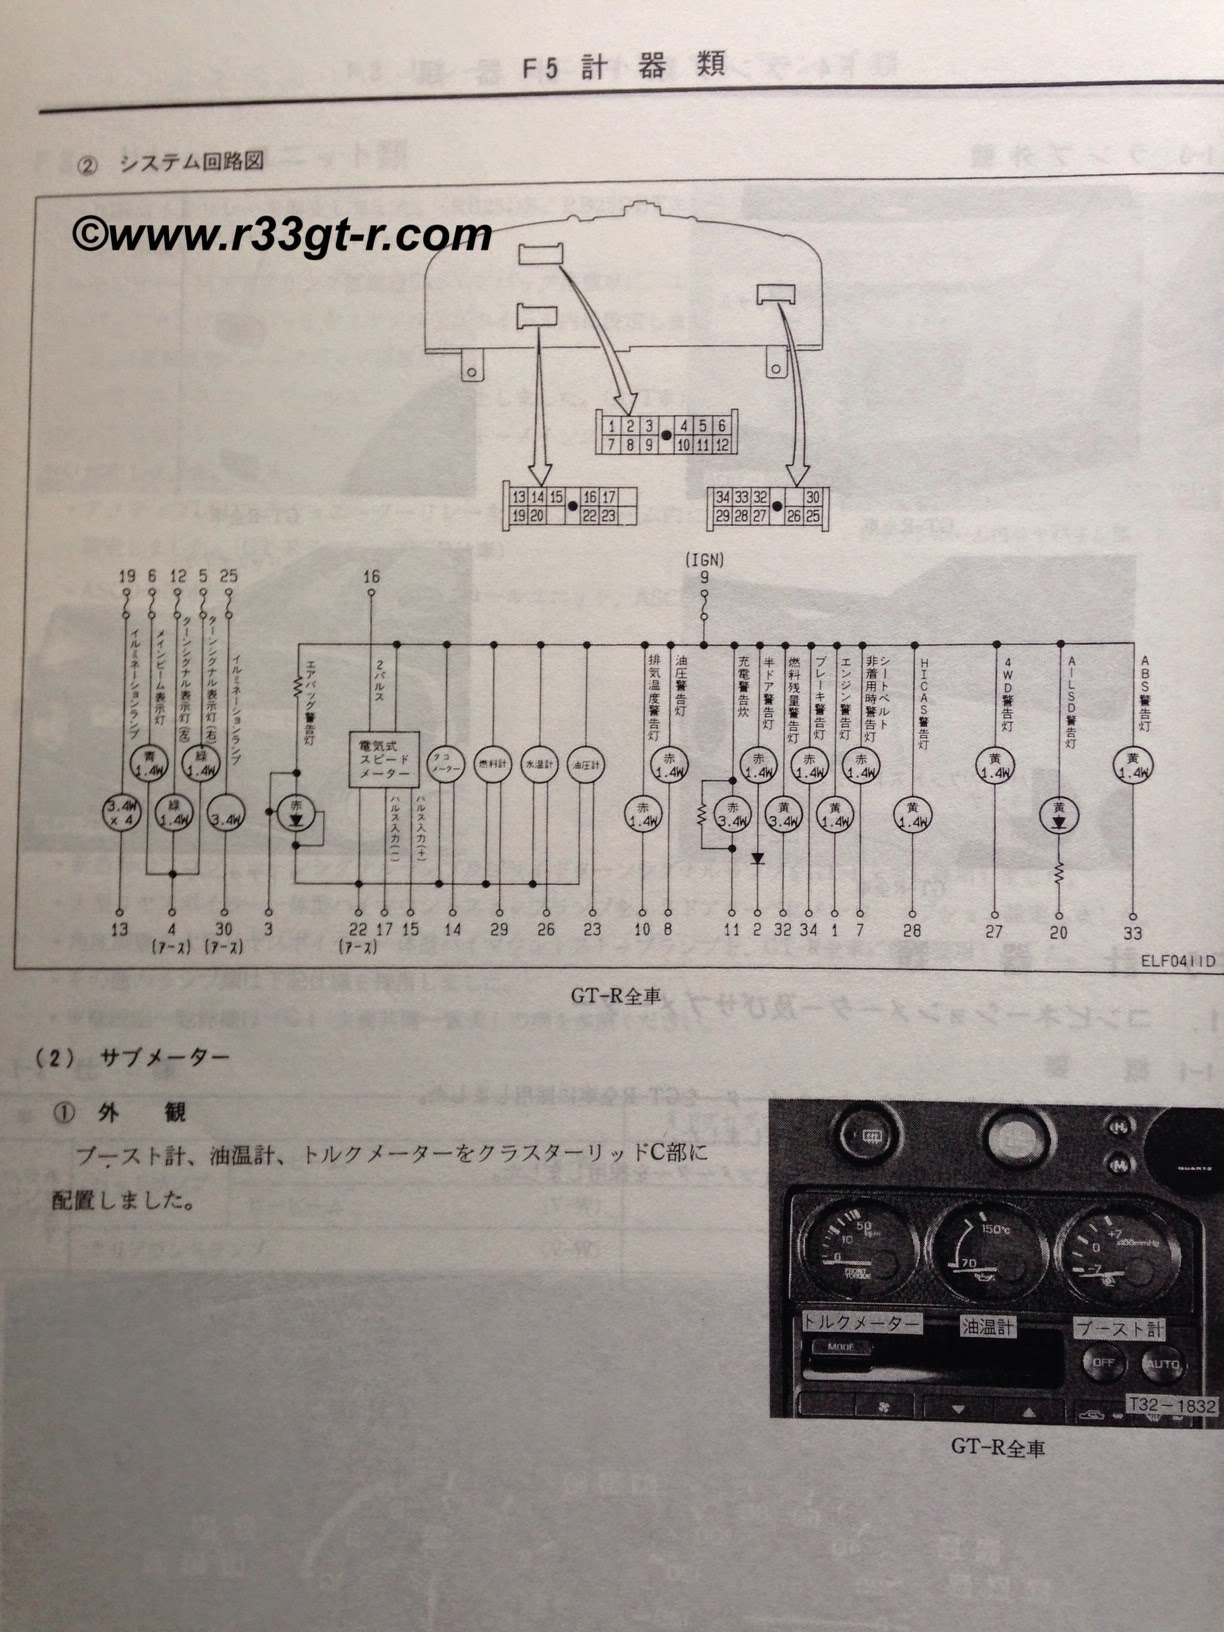 Skyline R33 Gtst Wiring Diagram Toyota Fujitsu Ten 86140 One Man 39s Lonely Adventures In His Gt R